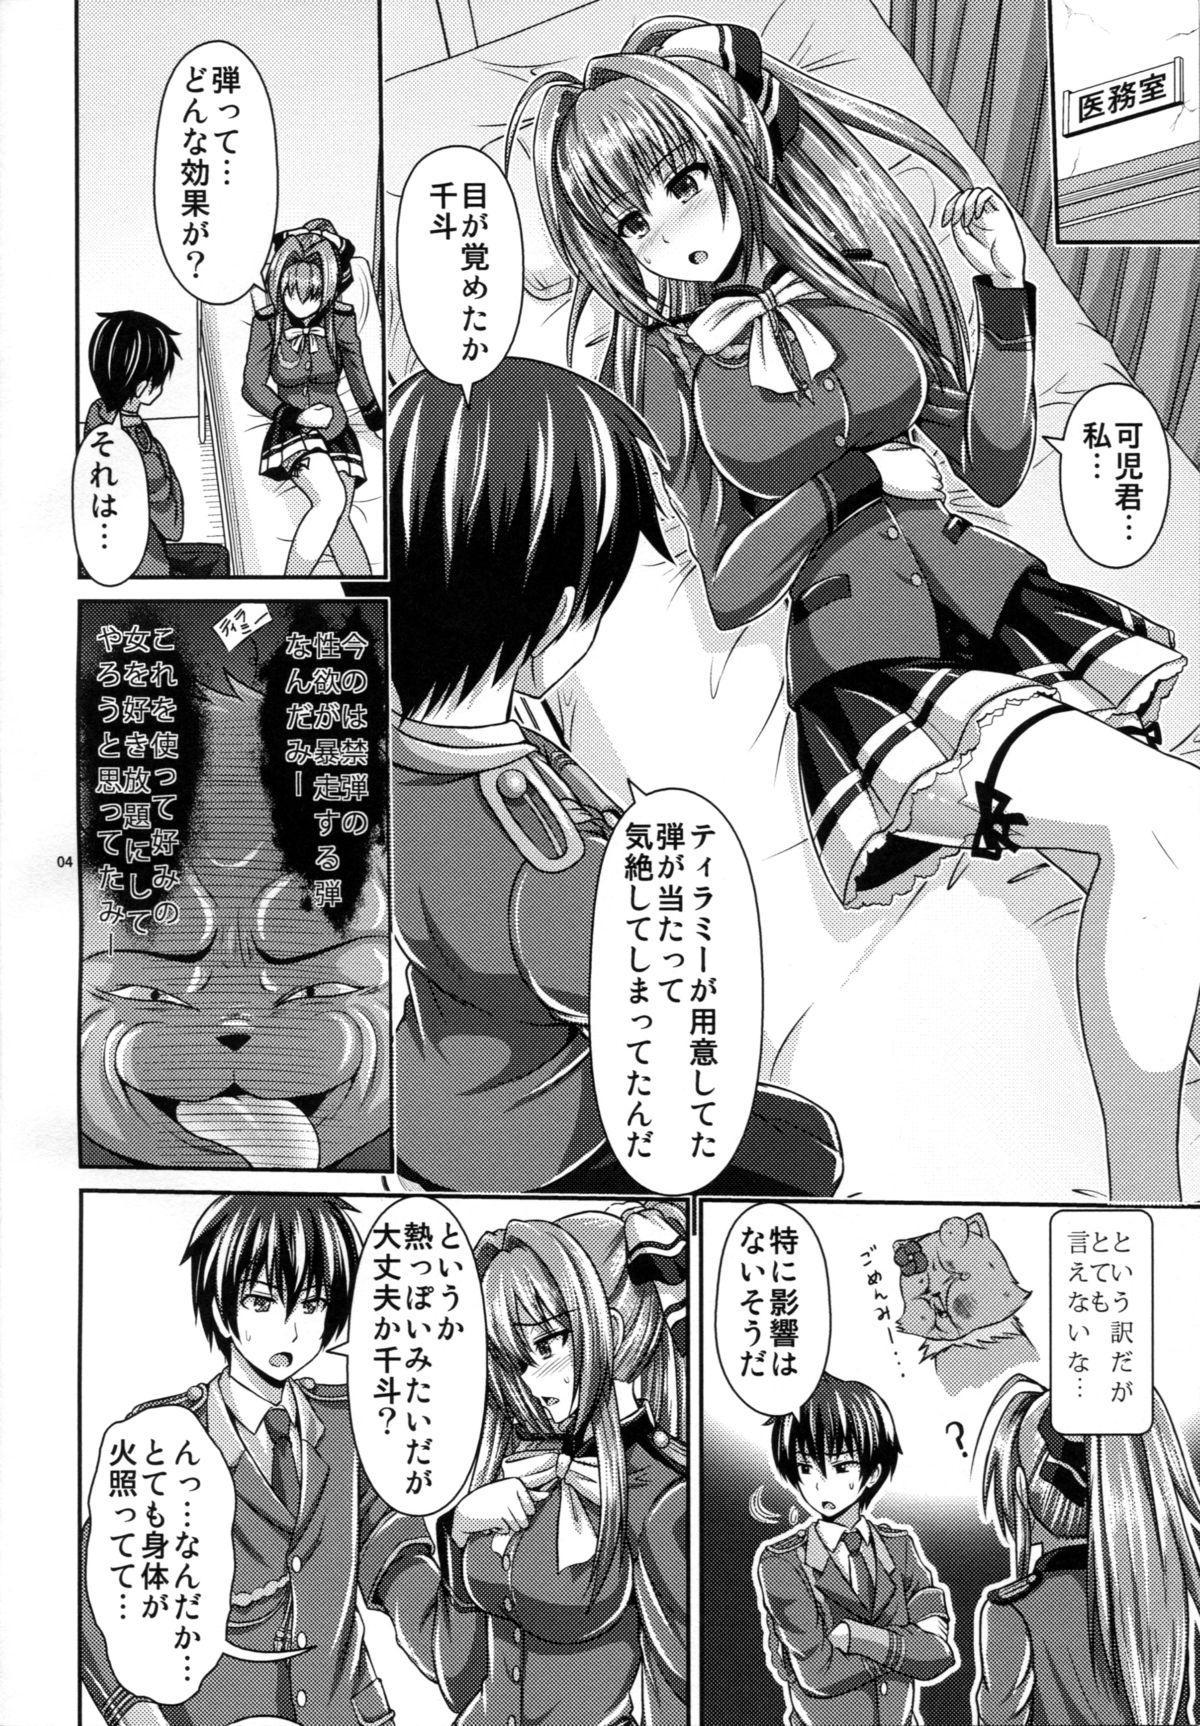 Ecchii Kimochi ga Tomannai! 2